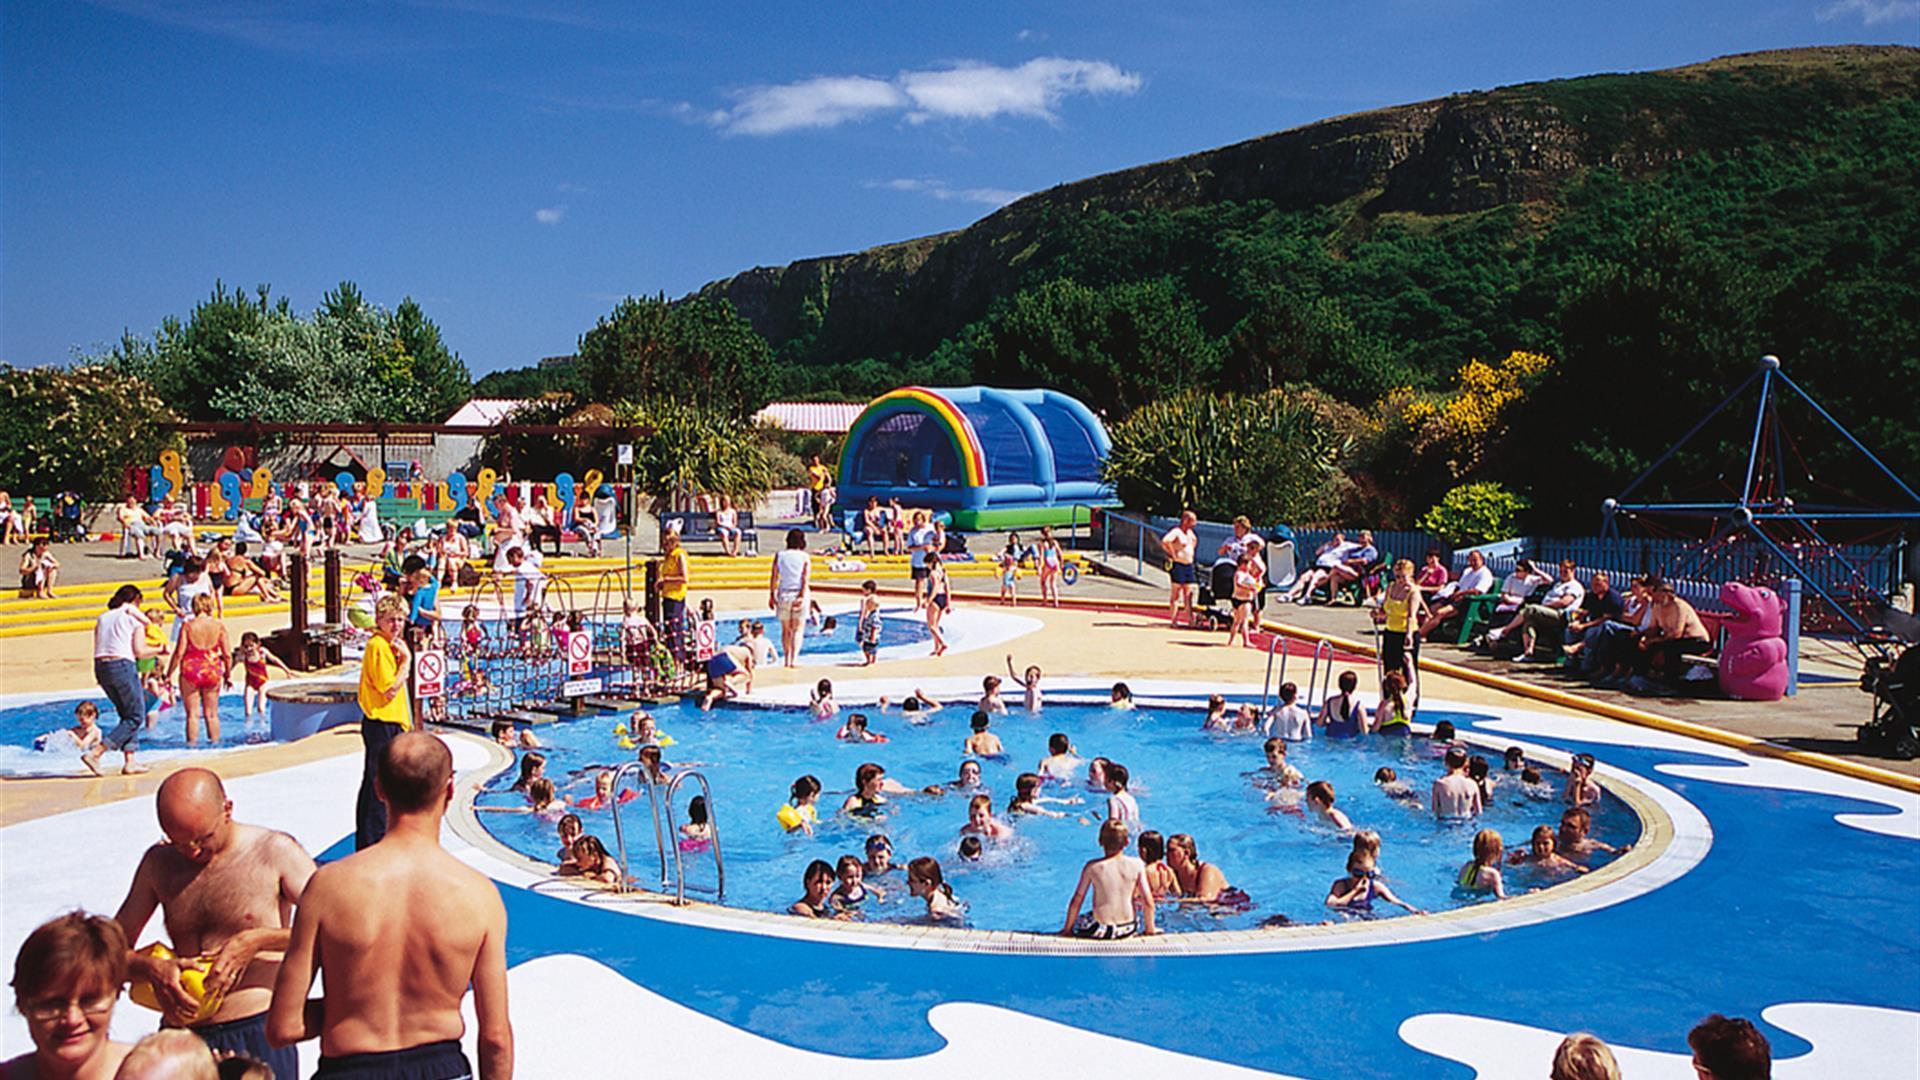 Benone Holiday & Leisure Park